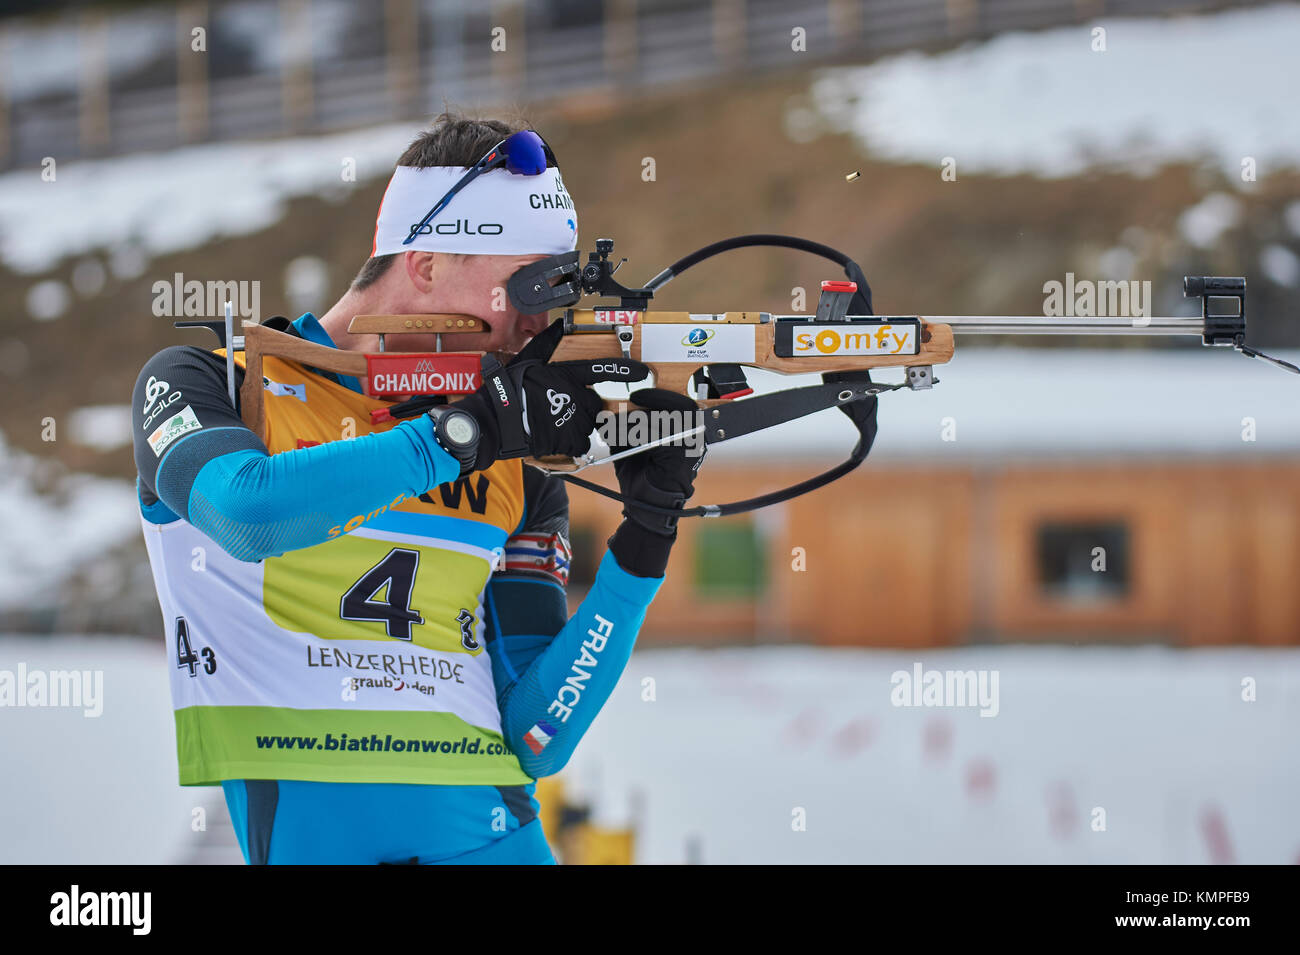 Lenzerheide, Switzerland. 8th Dec, 2017. DUMONT Clement (FRA) during the IBU Biathlon Cup Mixed Relay in Lenzerheide. - Stock Image